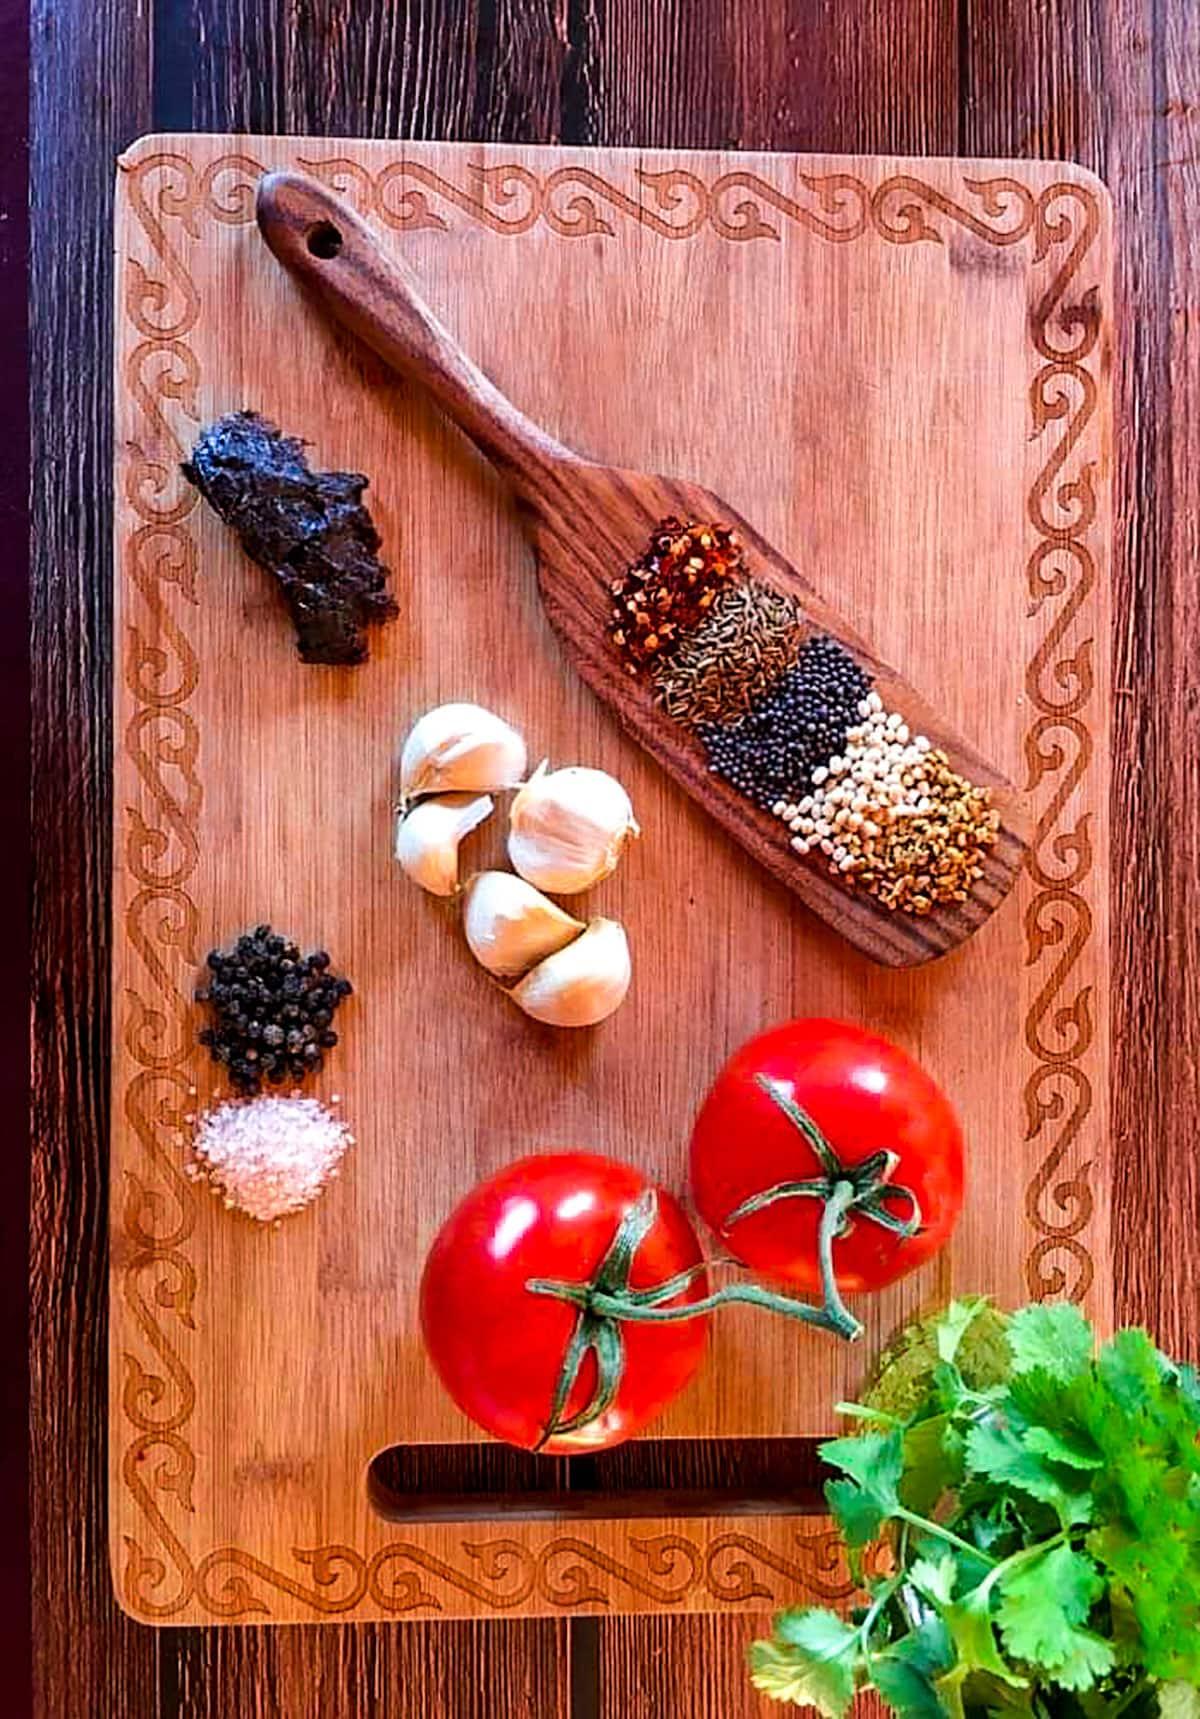 ingredients for tomato rasam